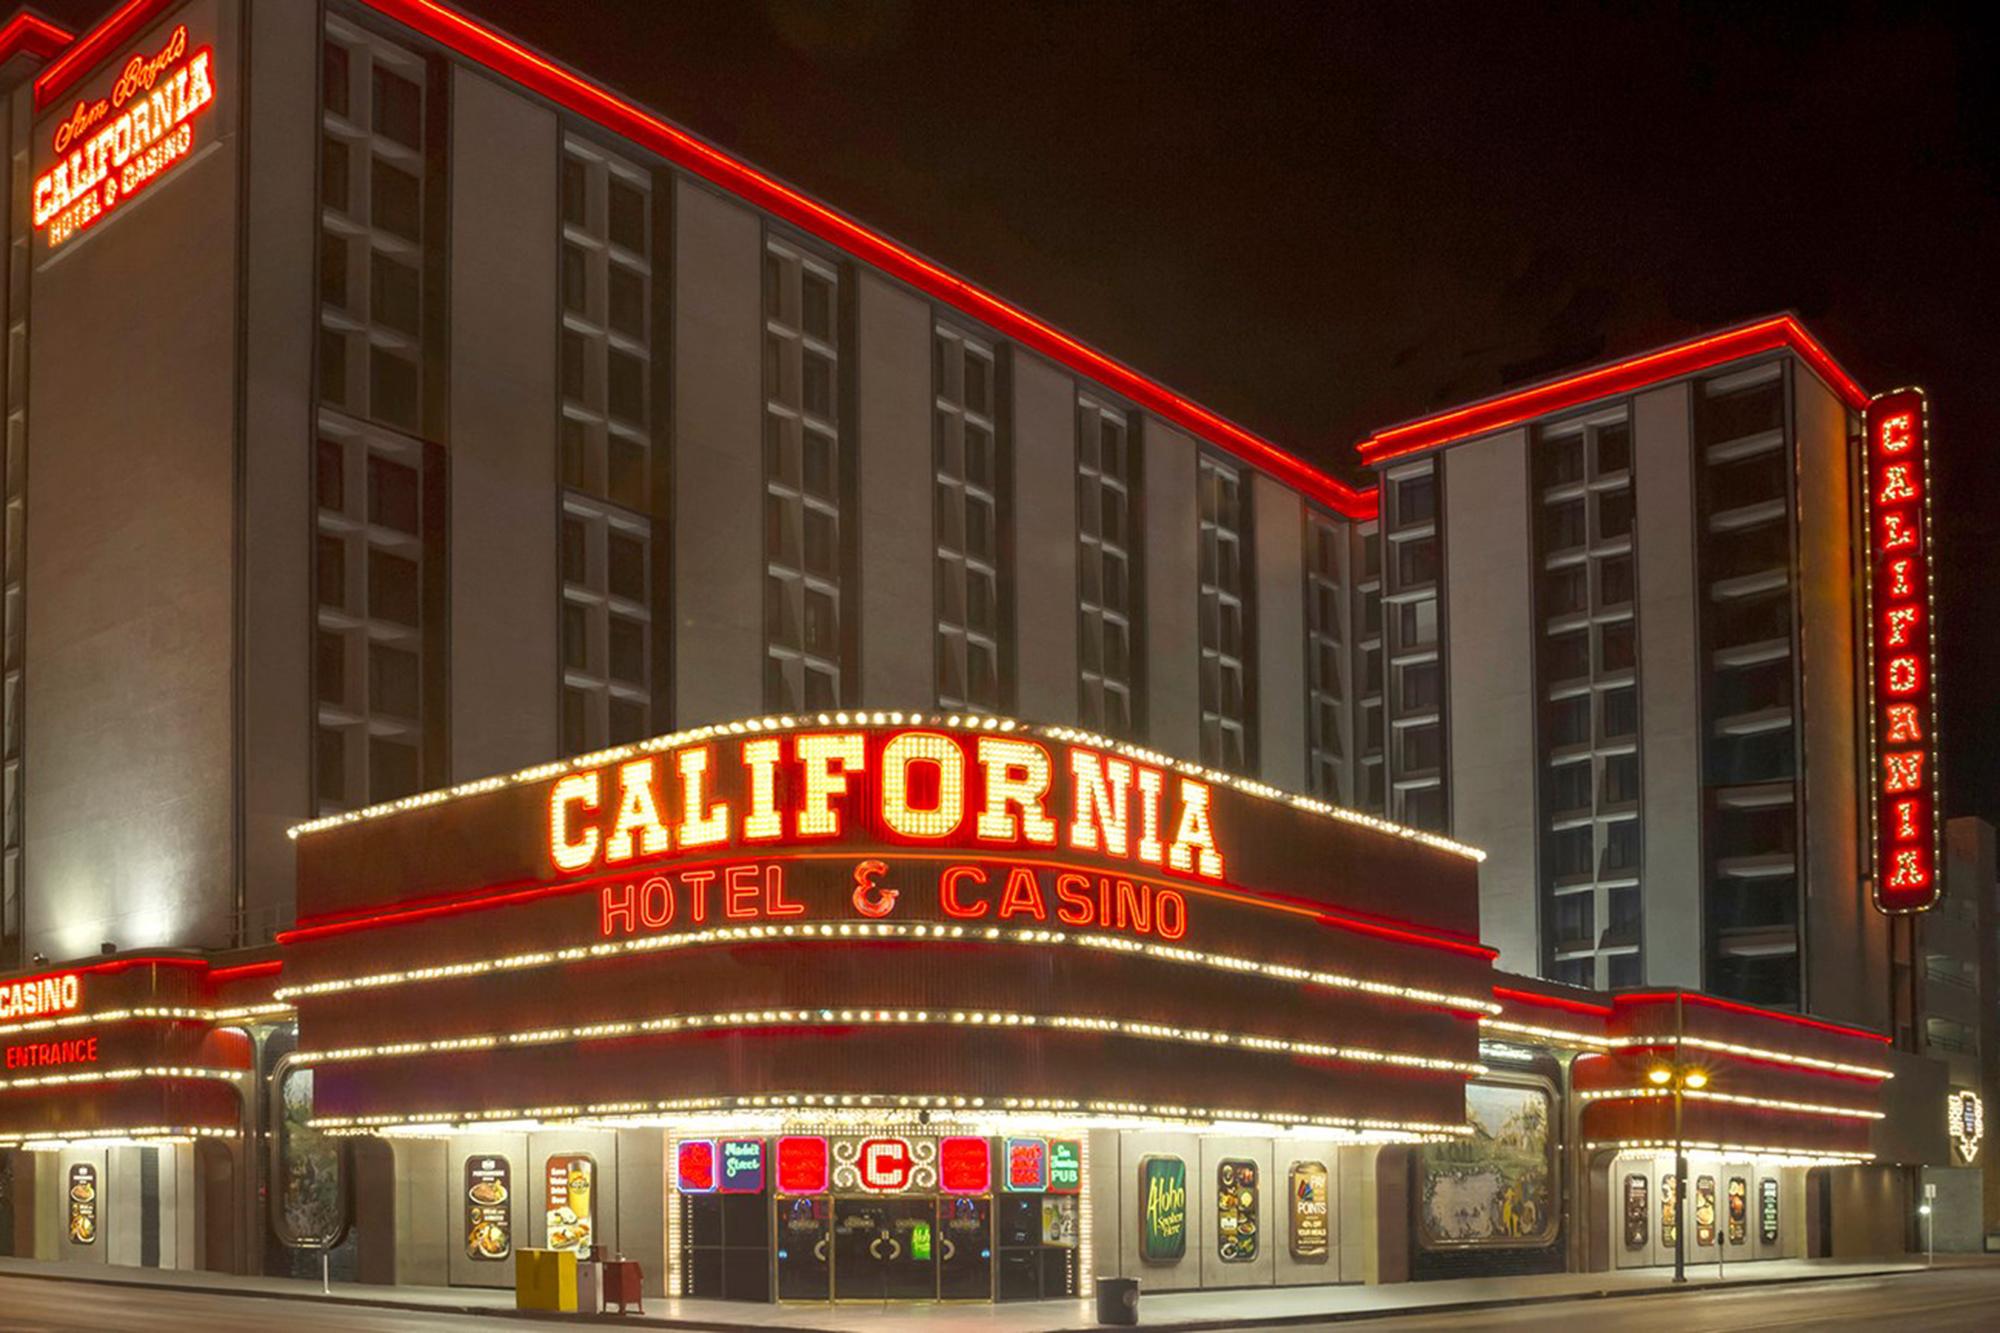 How Las Vegas Became The 9th Island Hawaiians And The California Hotel News Center University Of Nevada Las Vegas